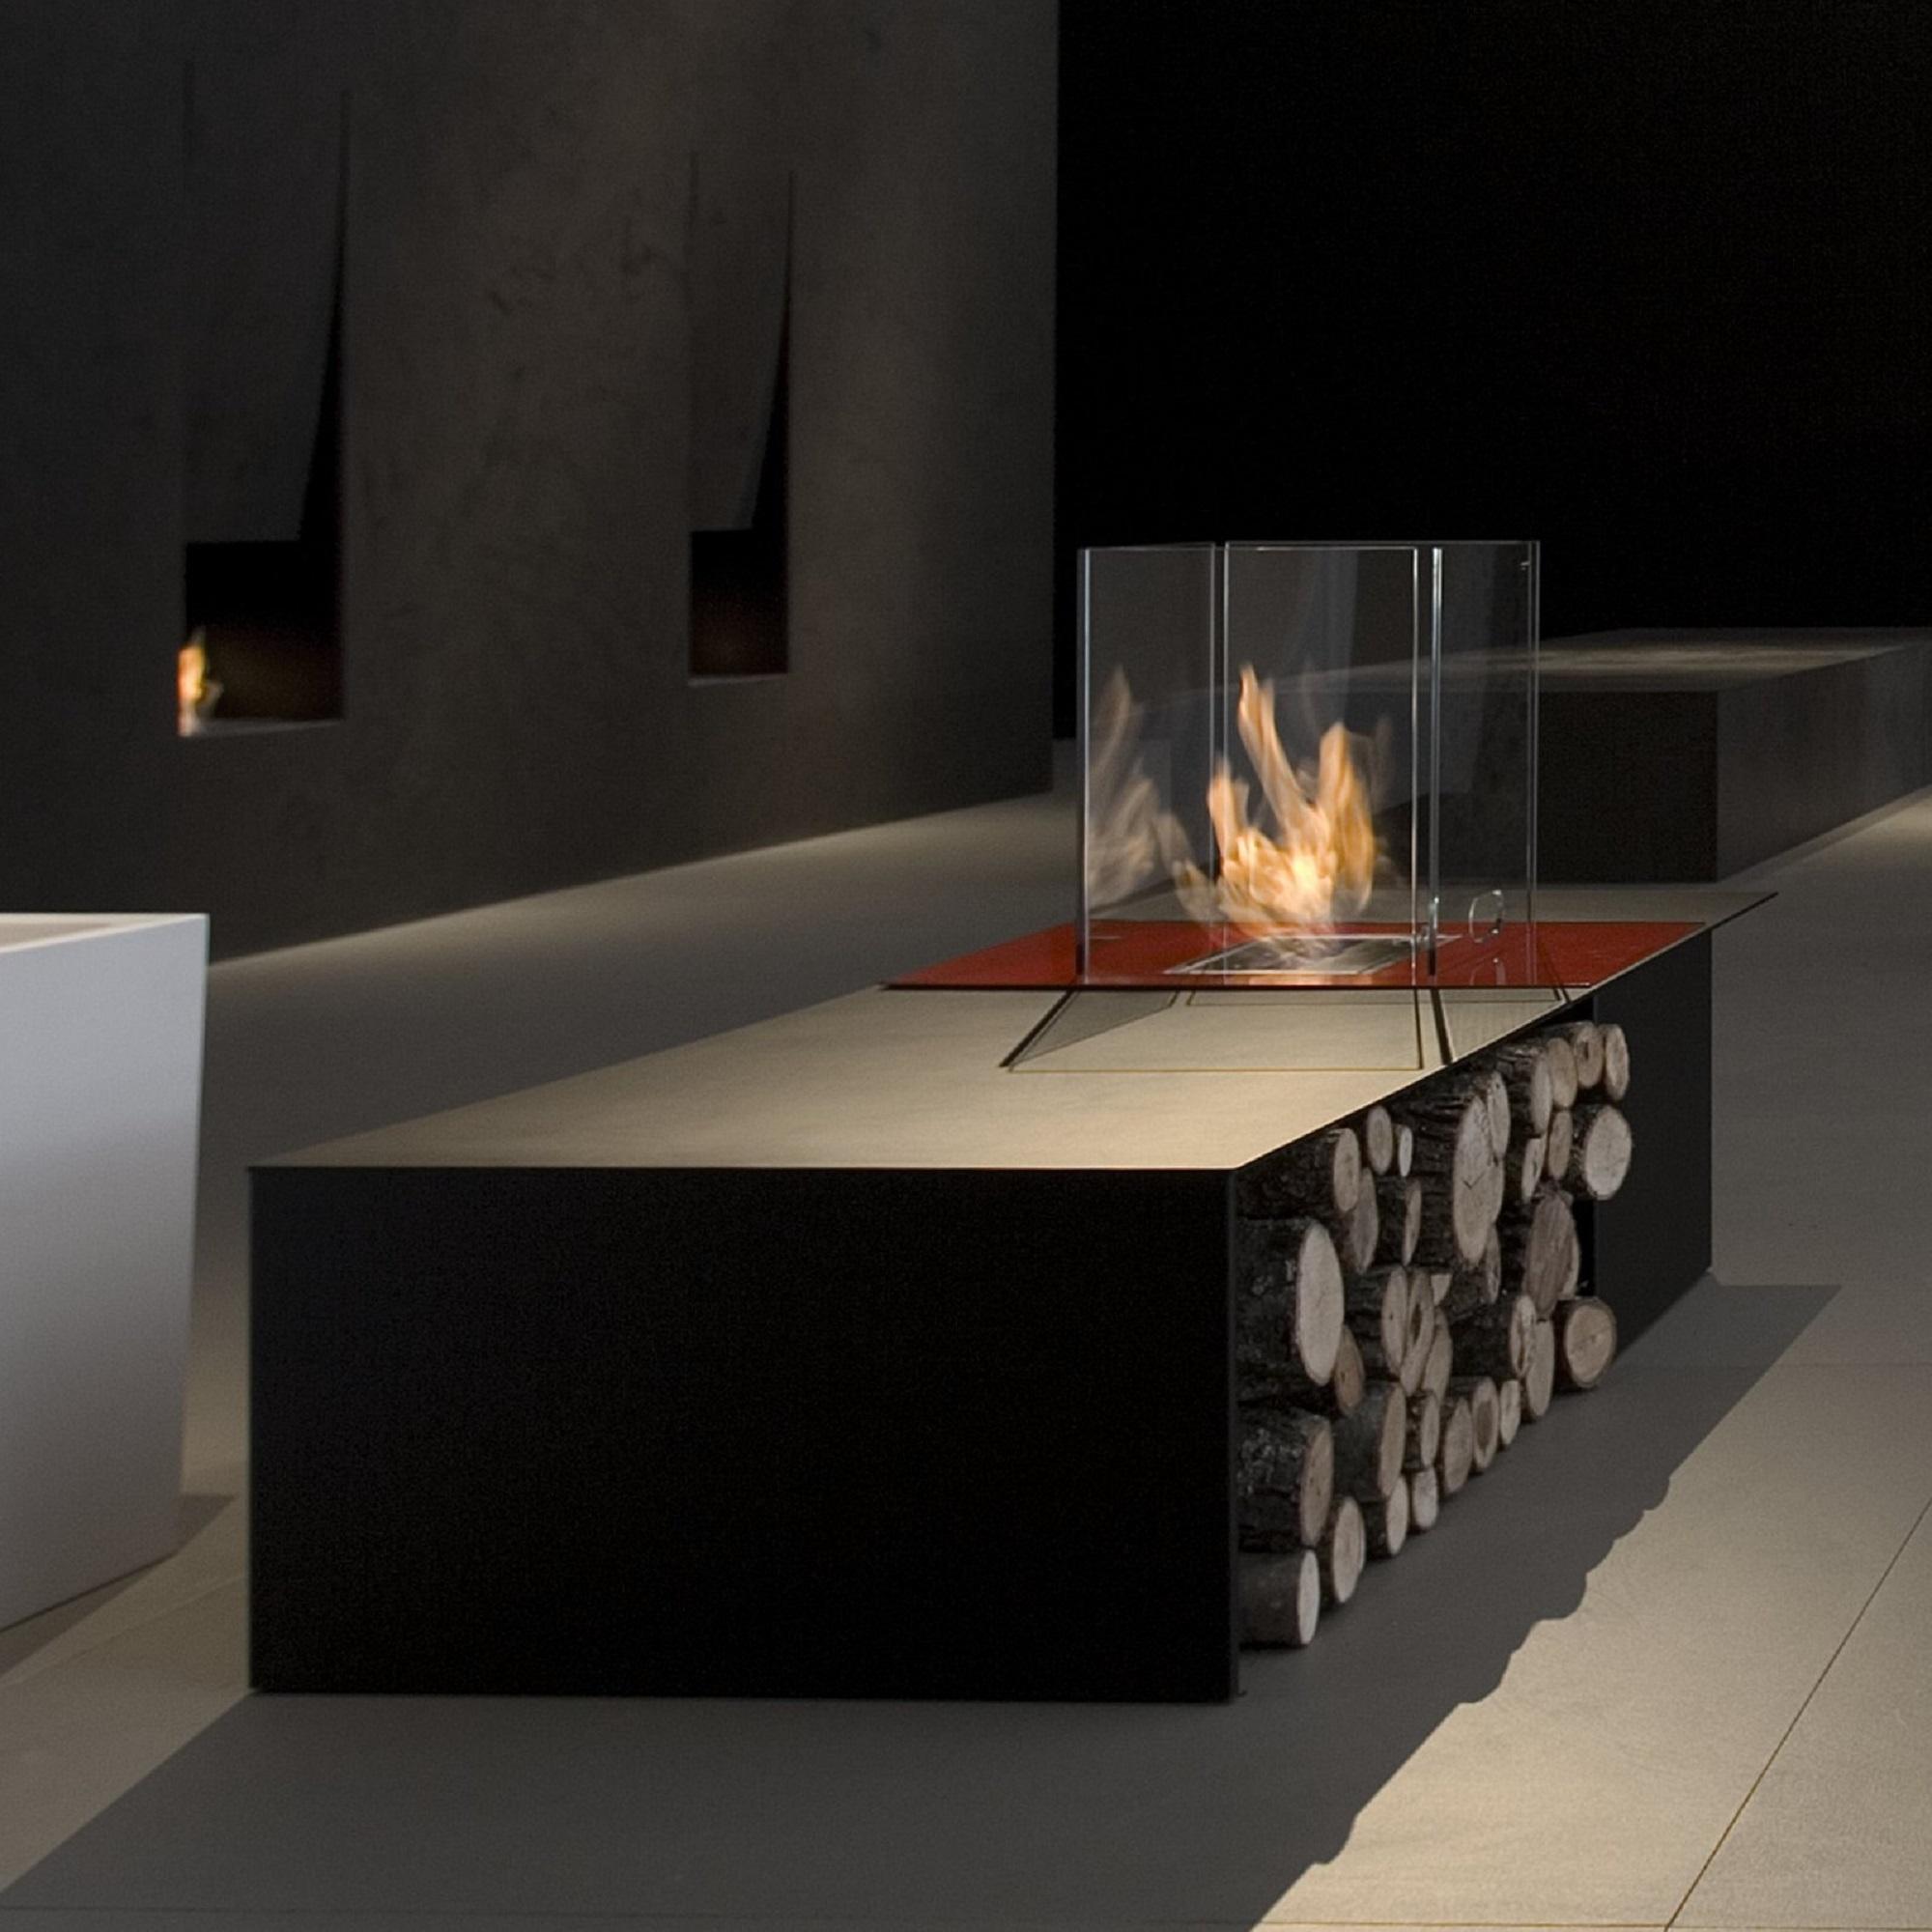 fireplace portable ebay electric itm northwest heater mini table